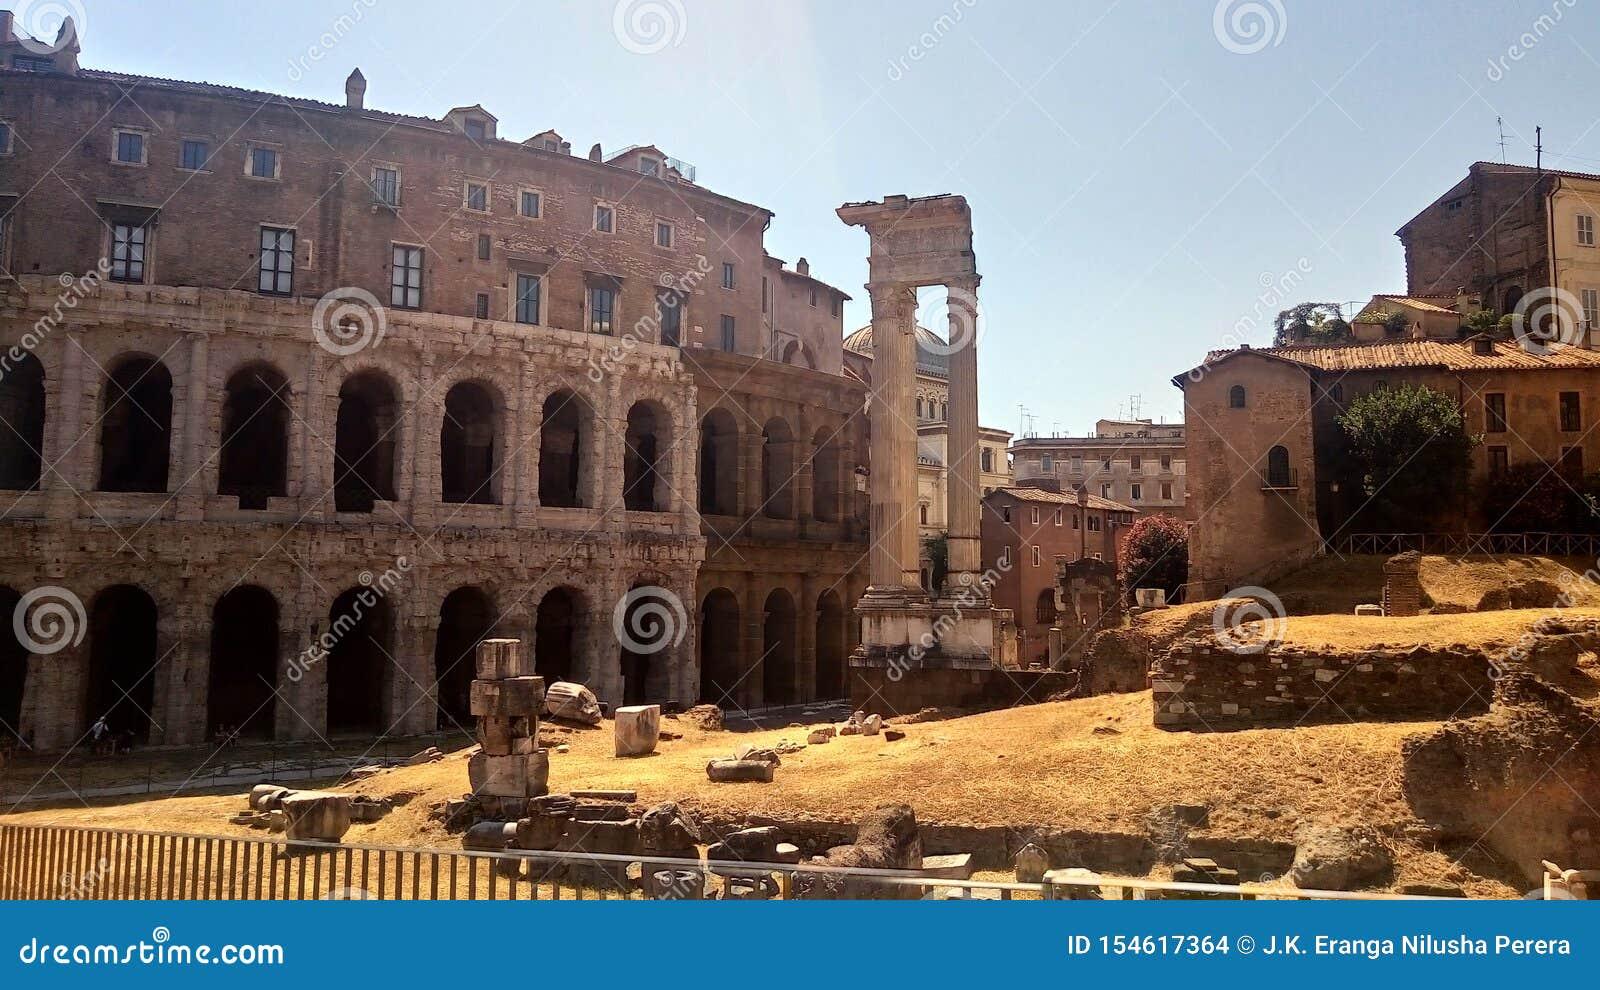 Theatre of Marcellus and Temple of Appolo Medicus Sosianus